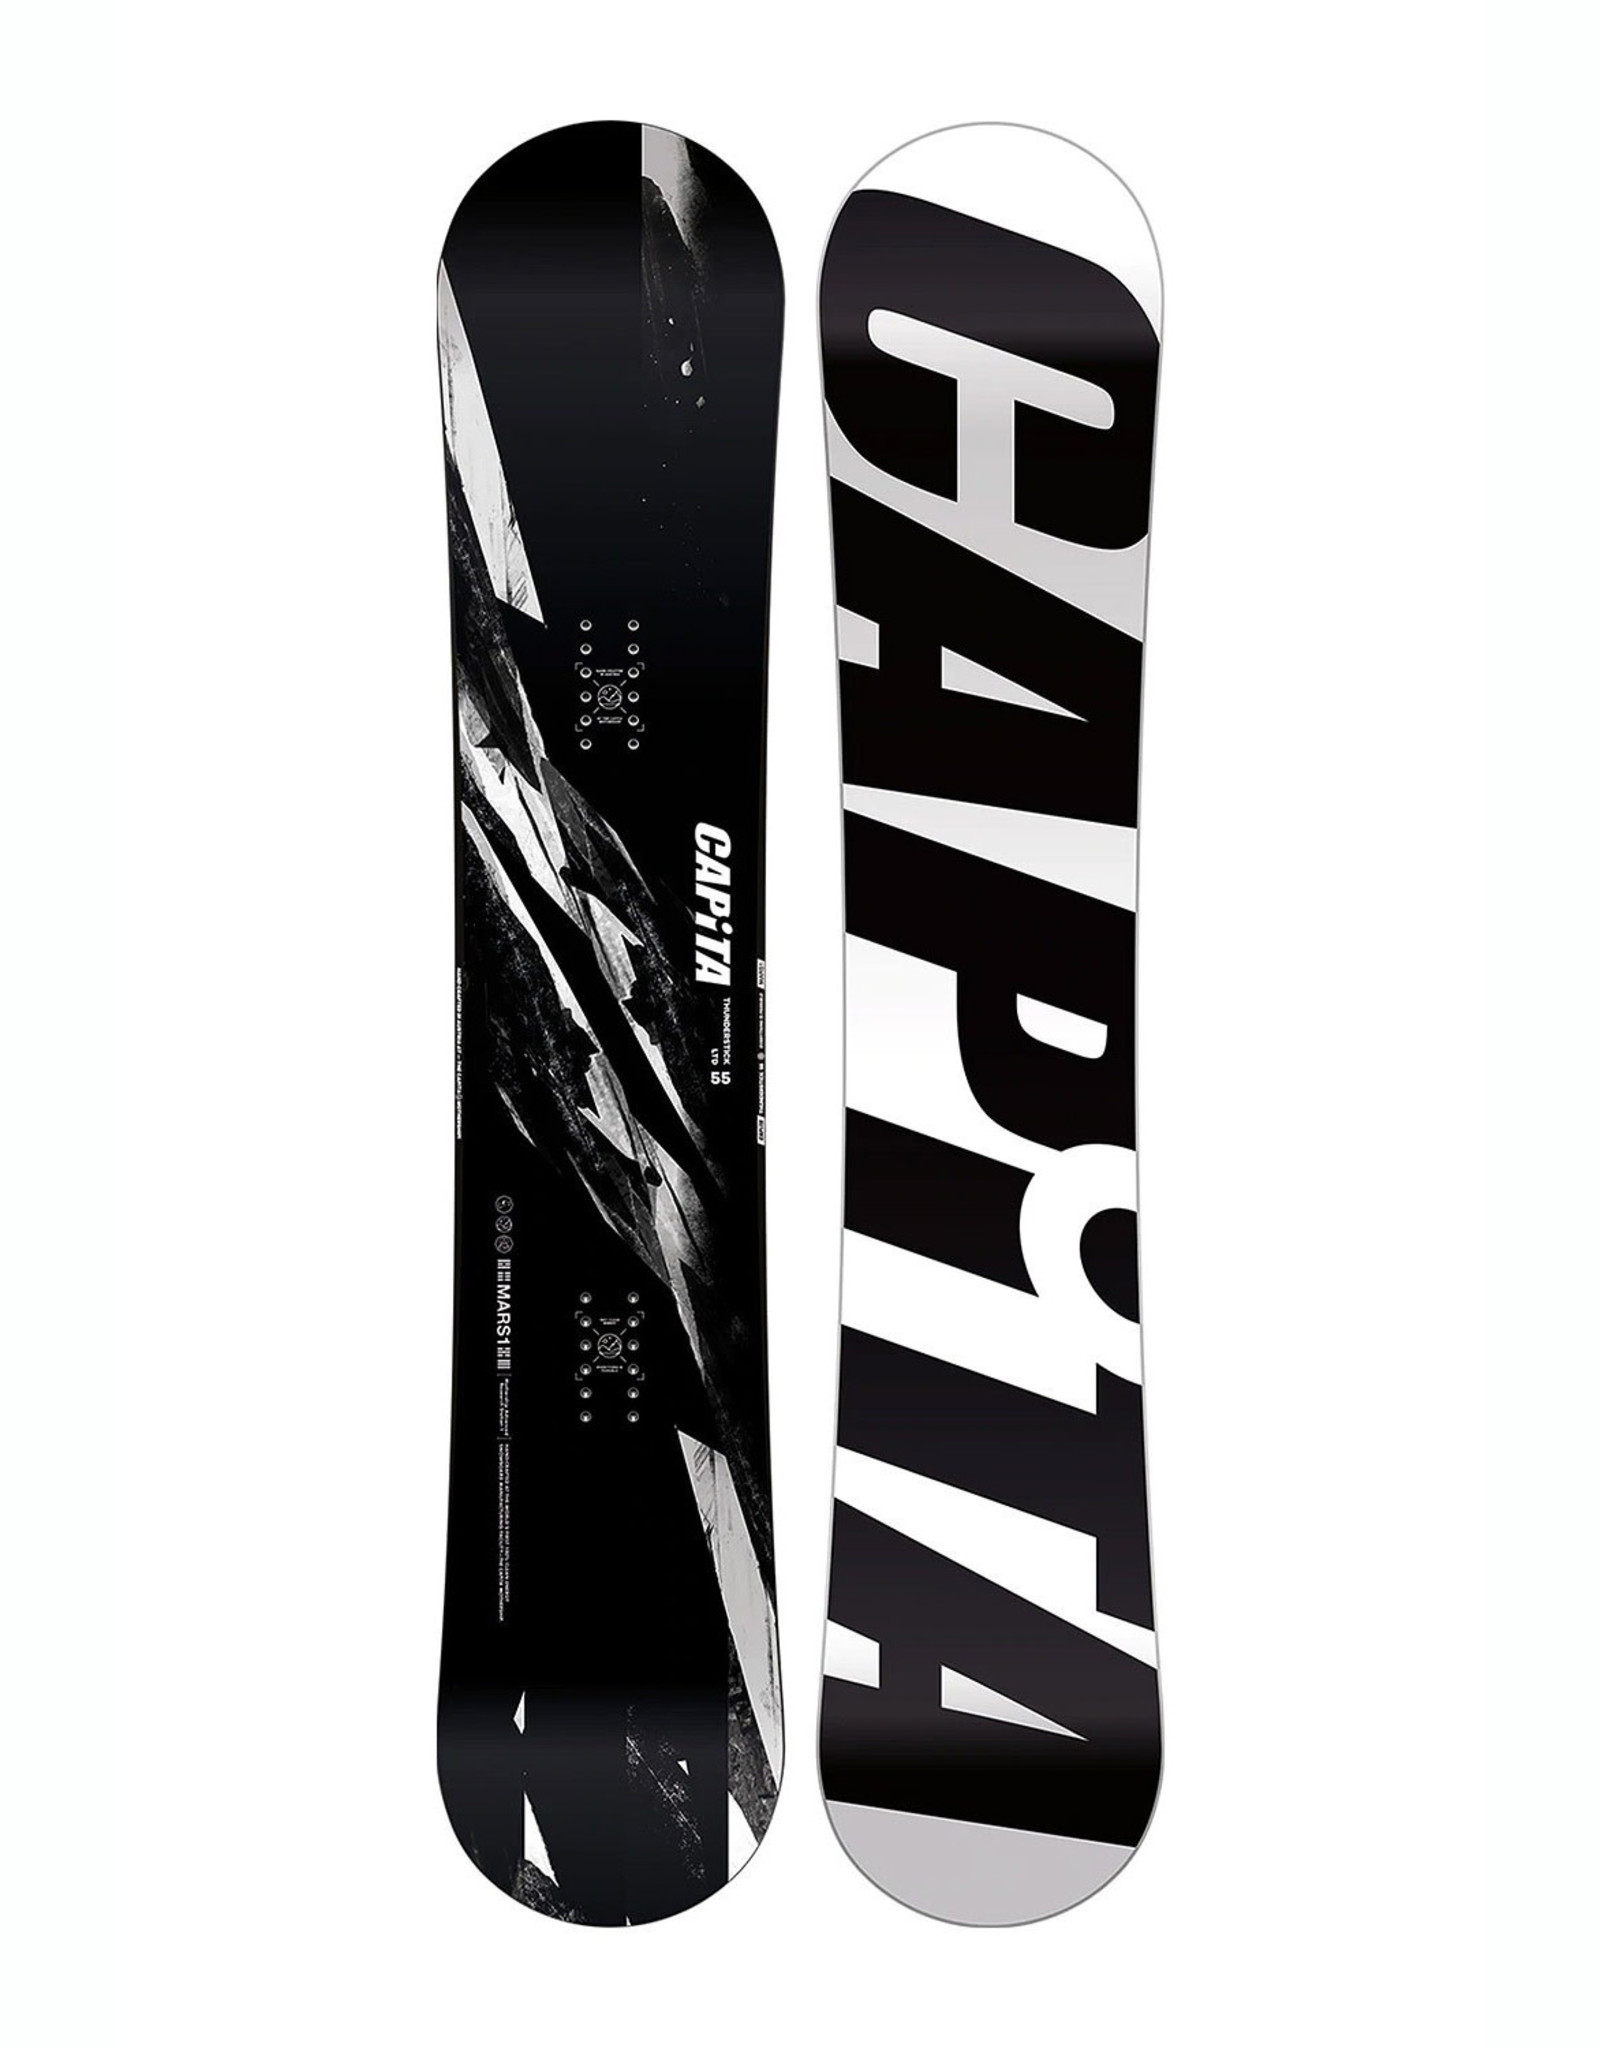 Capita - THUNDERSTICK (2021) - 153cm